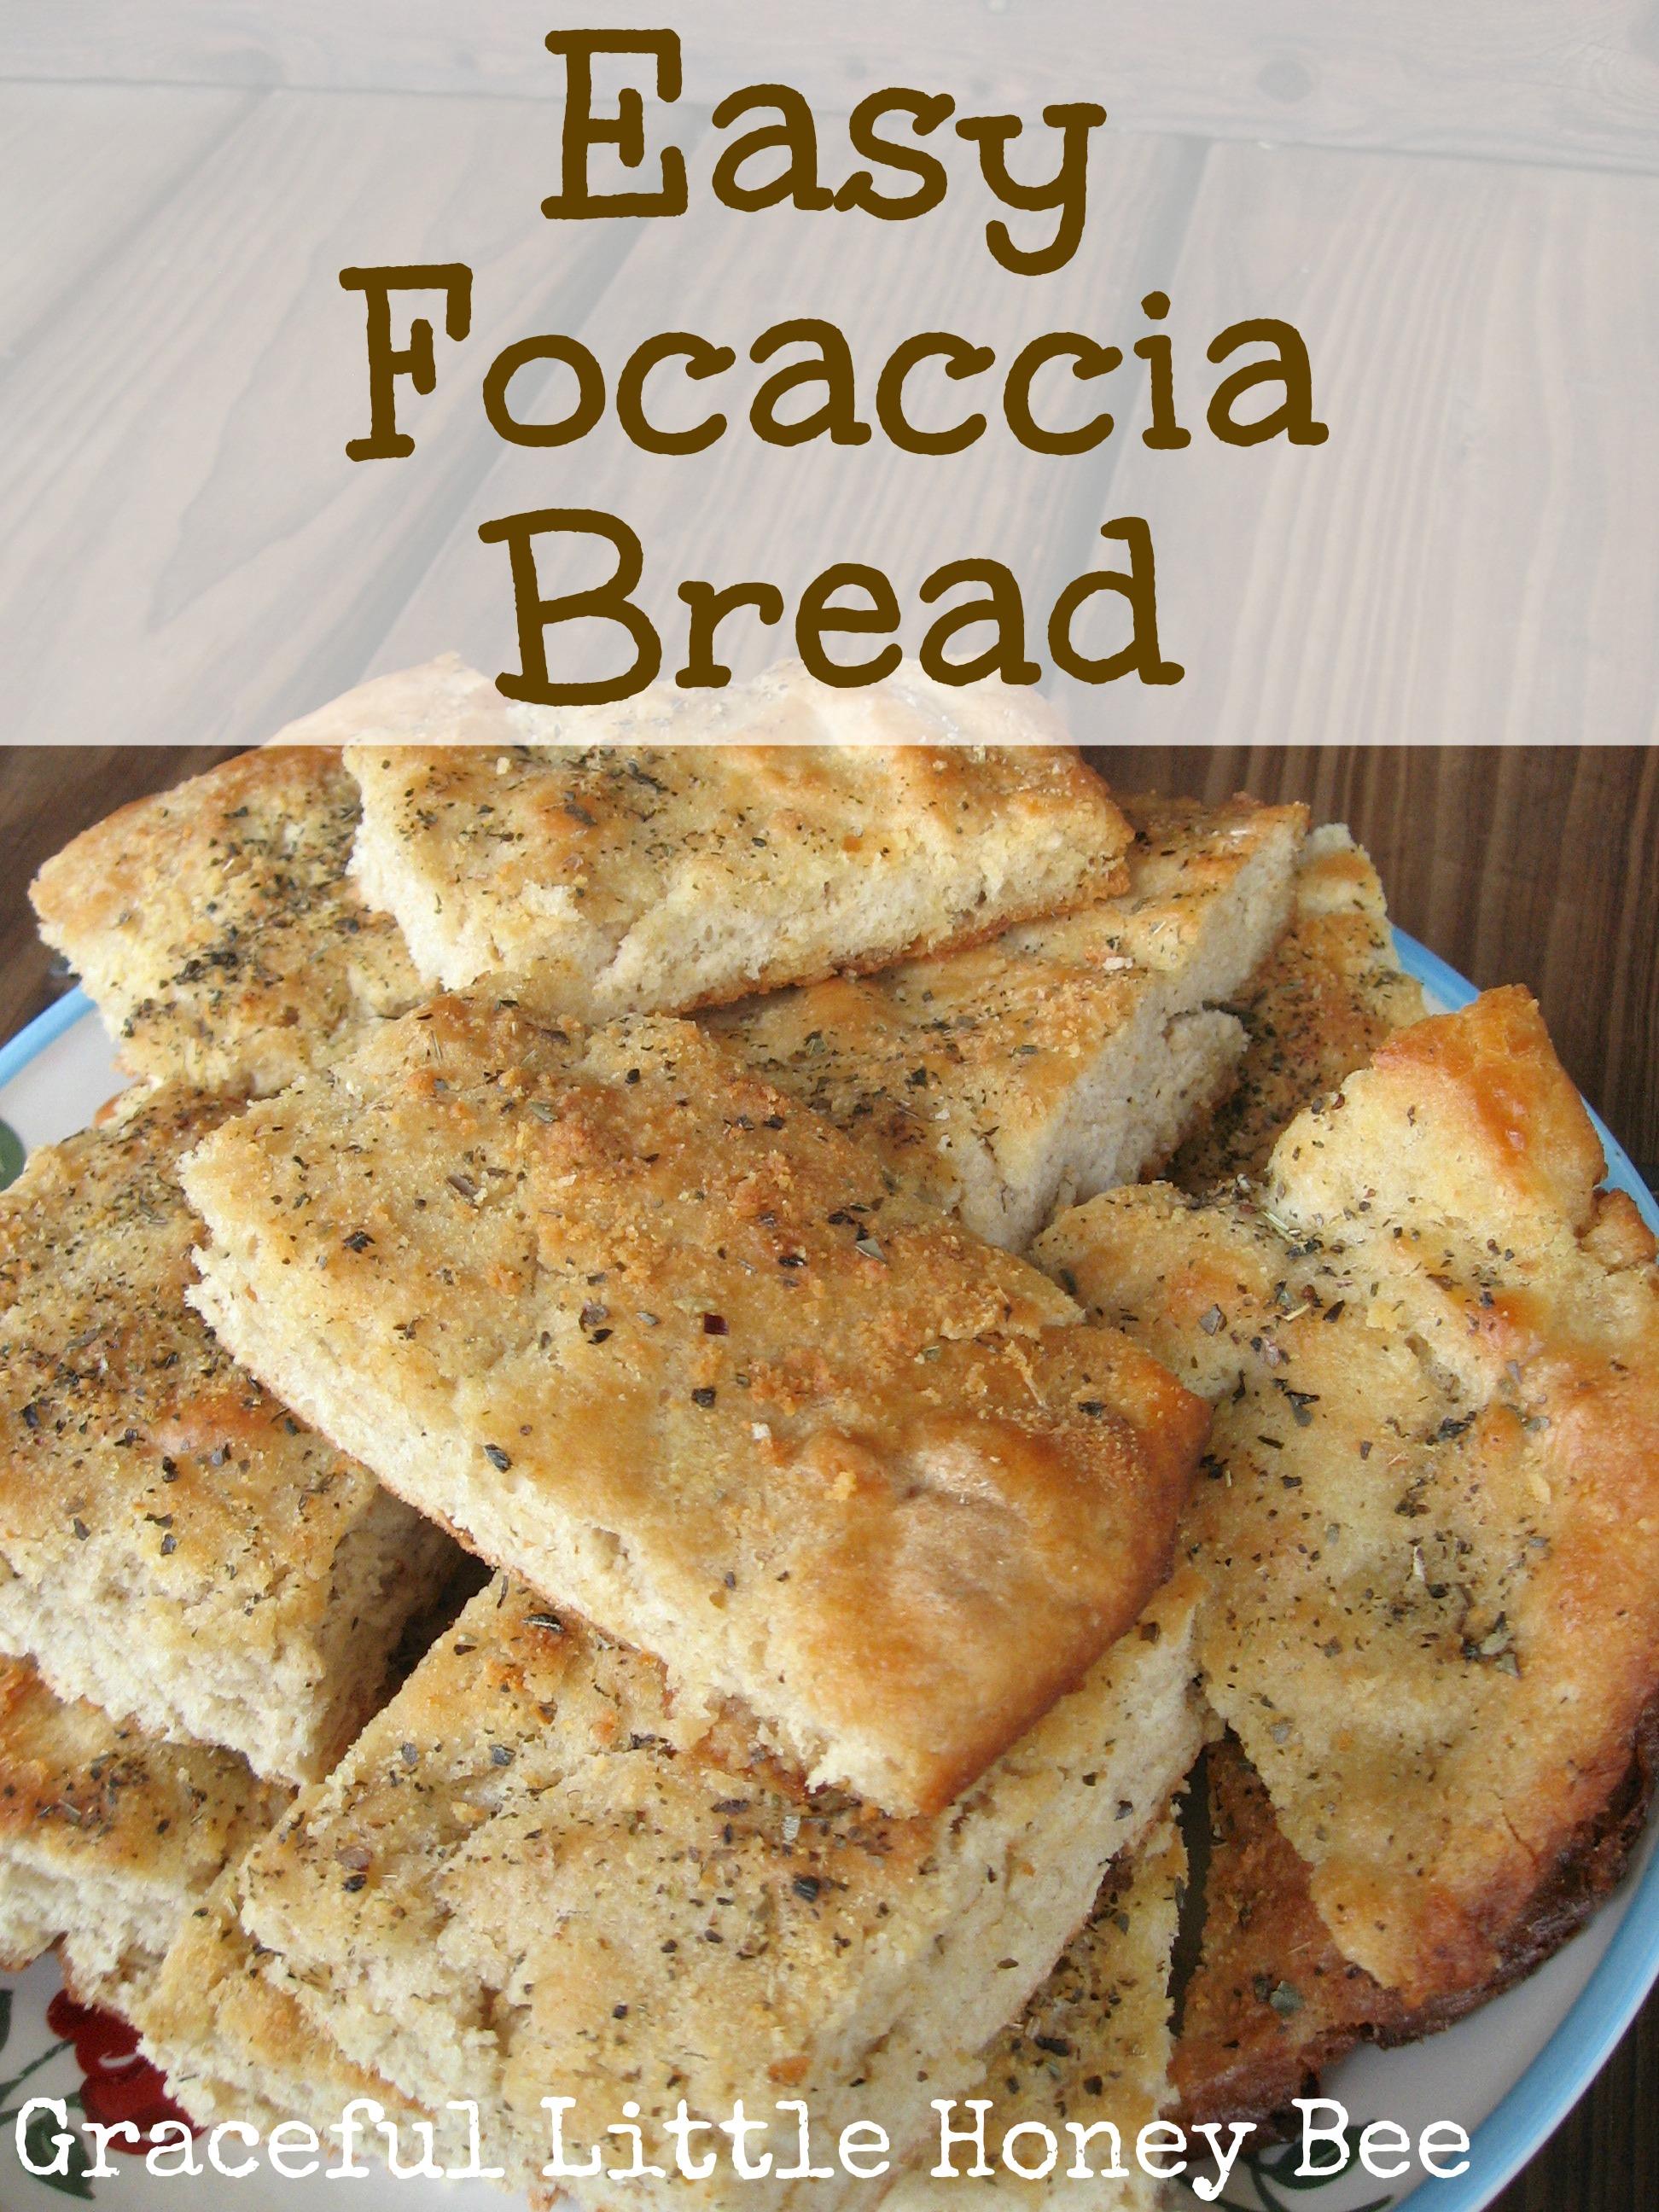 easy focaccia bread recipe by missy rakes on november 14 2014 6 ...